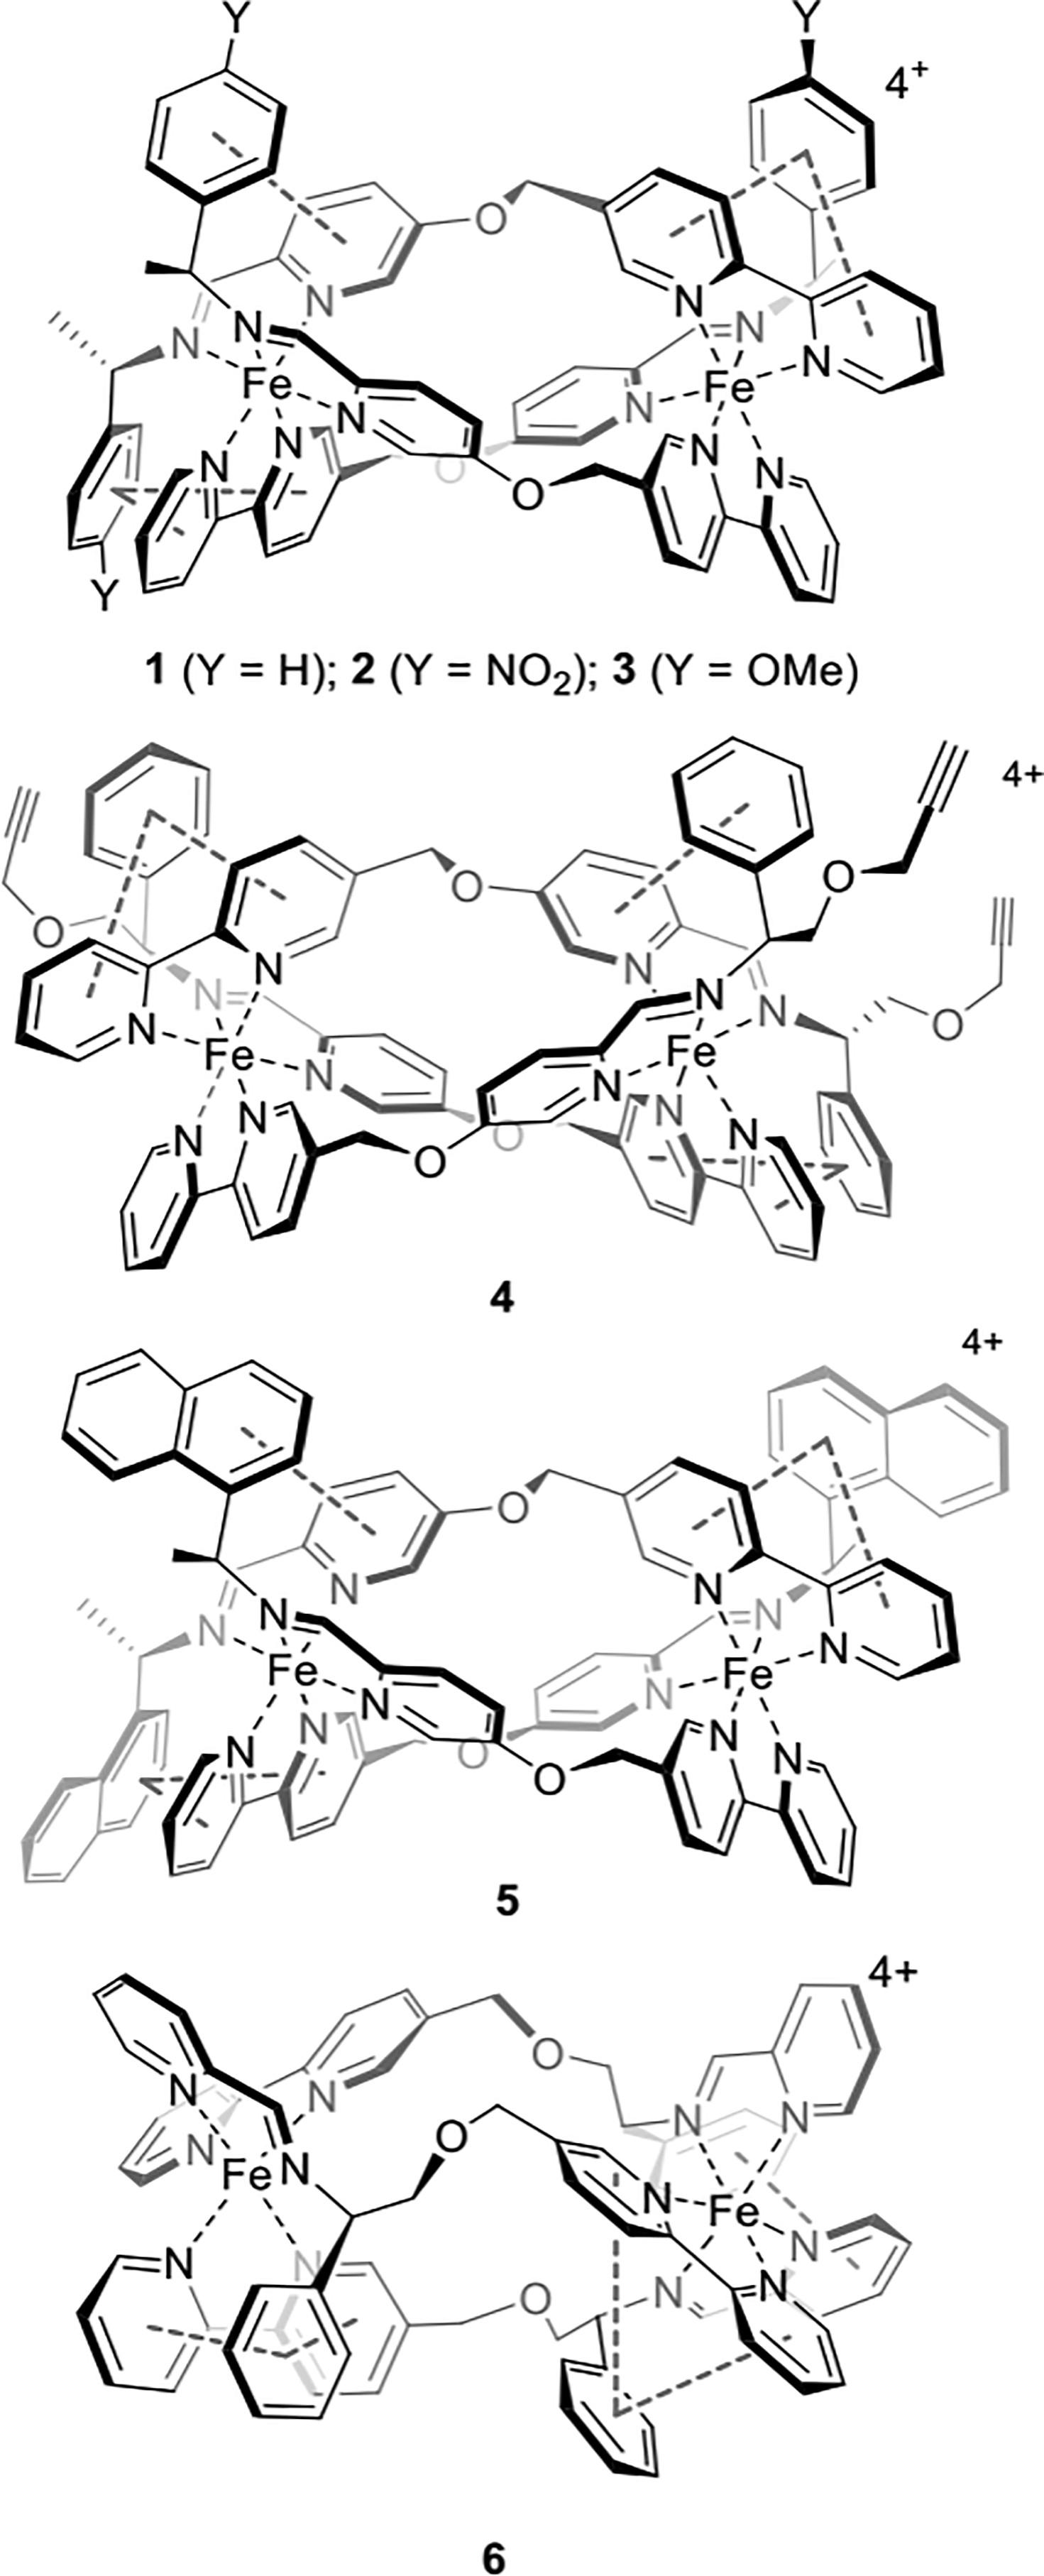 antifreeze complex